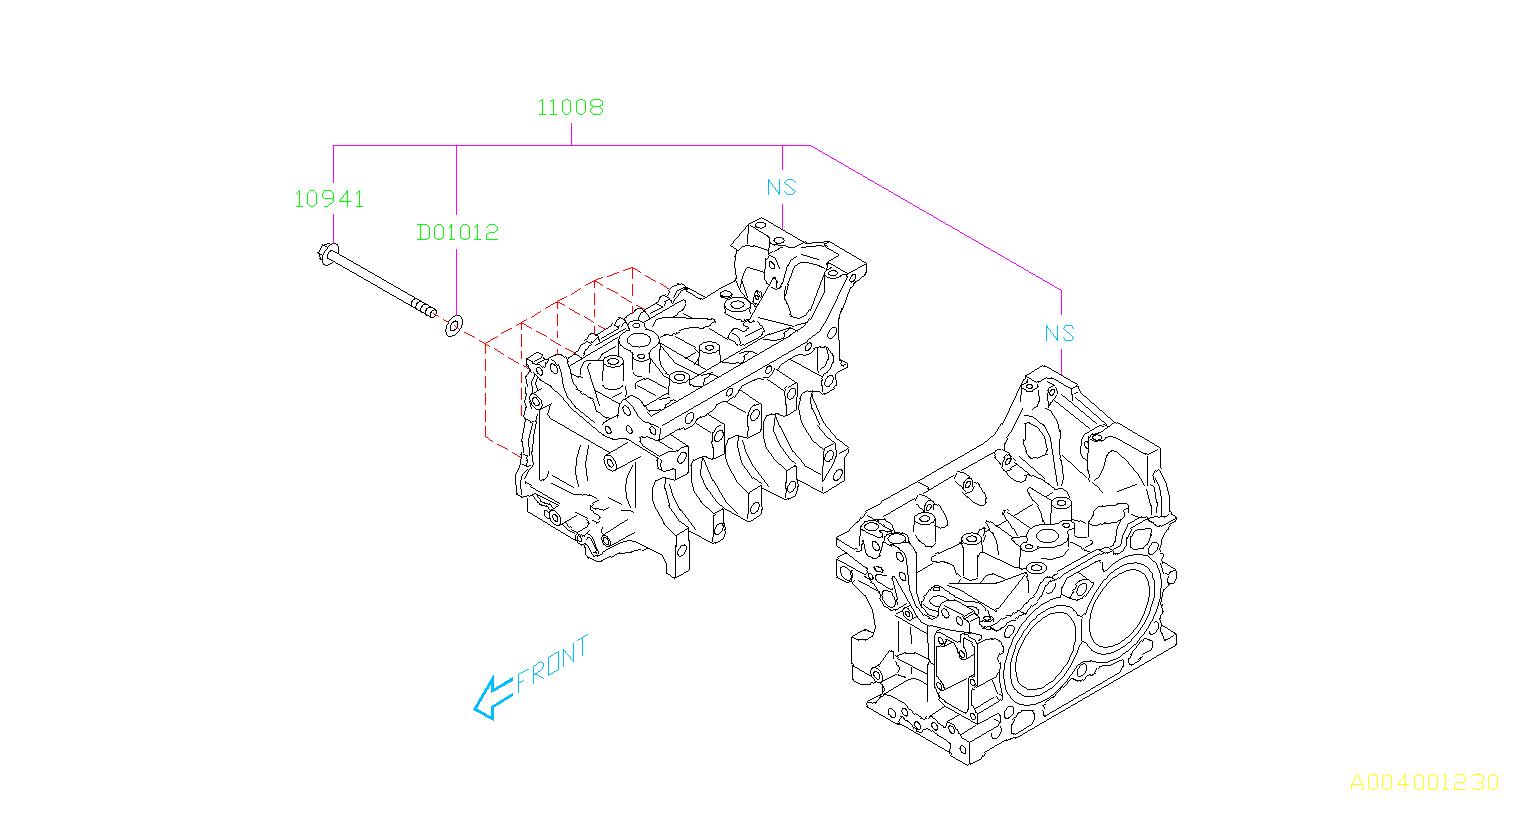 2013 Subaru BRZ Engine Crankshaft Main Bearing Cap Bolt